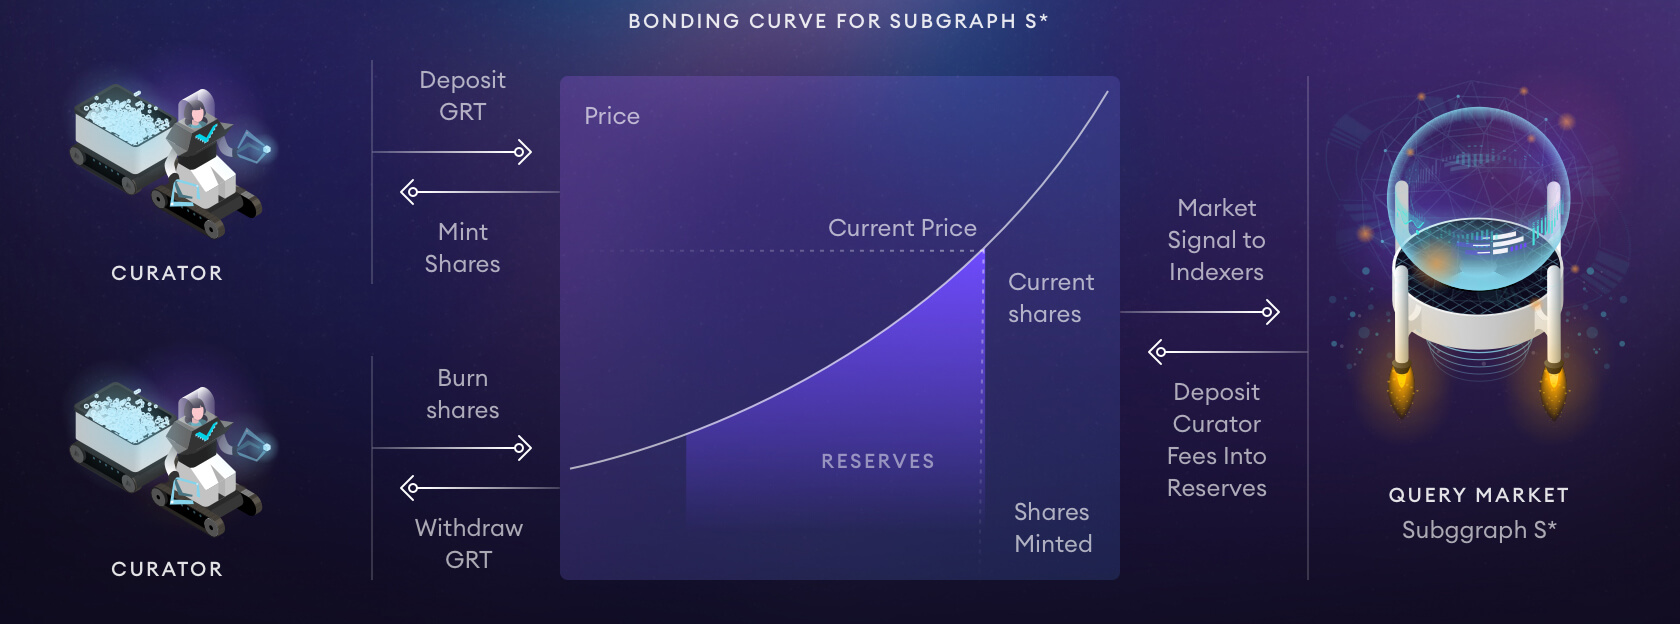 Curator bonding curve